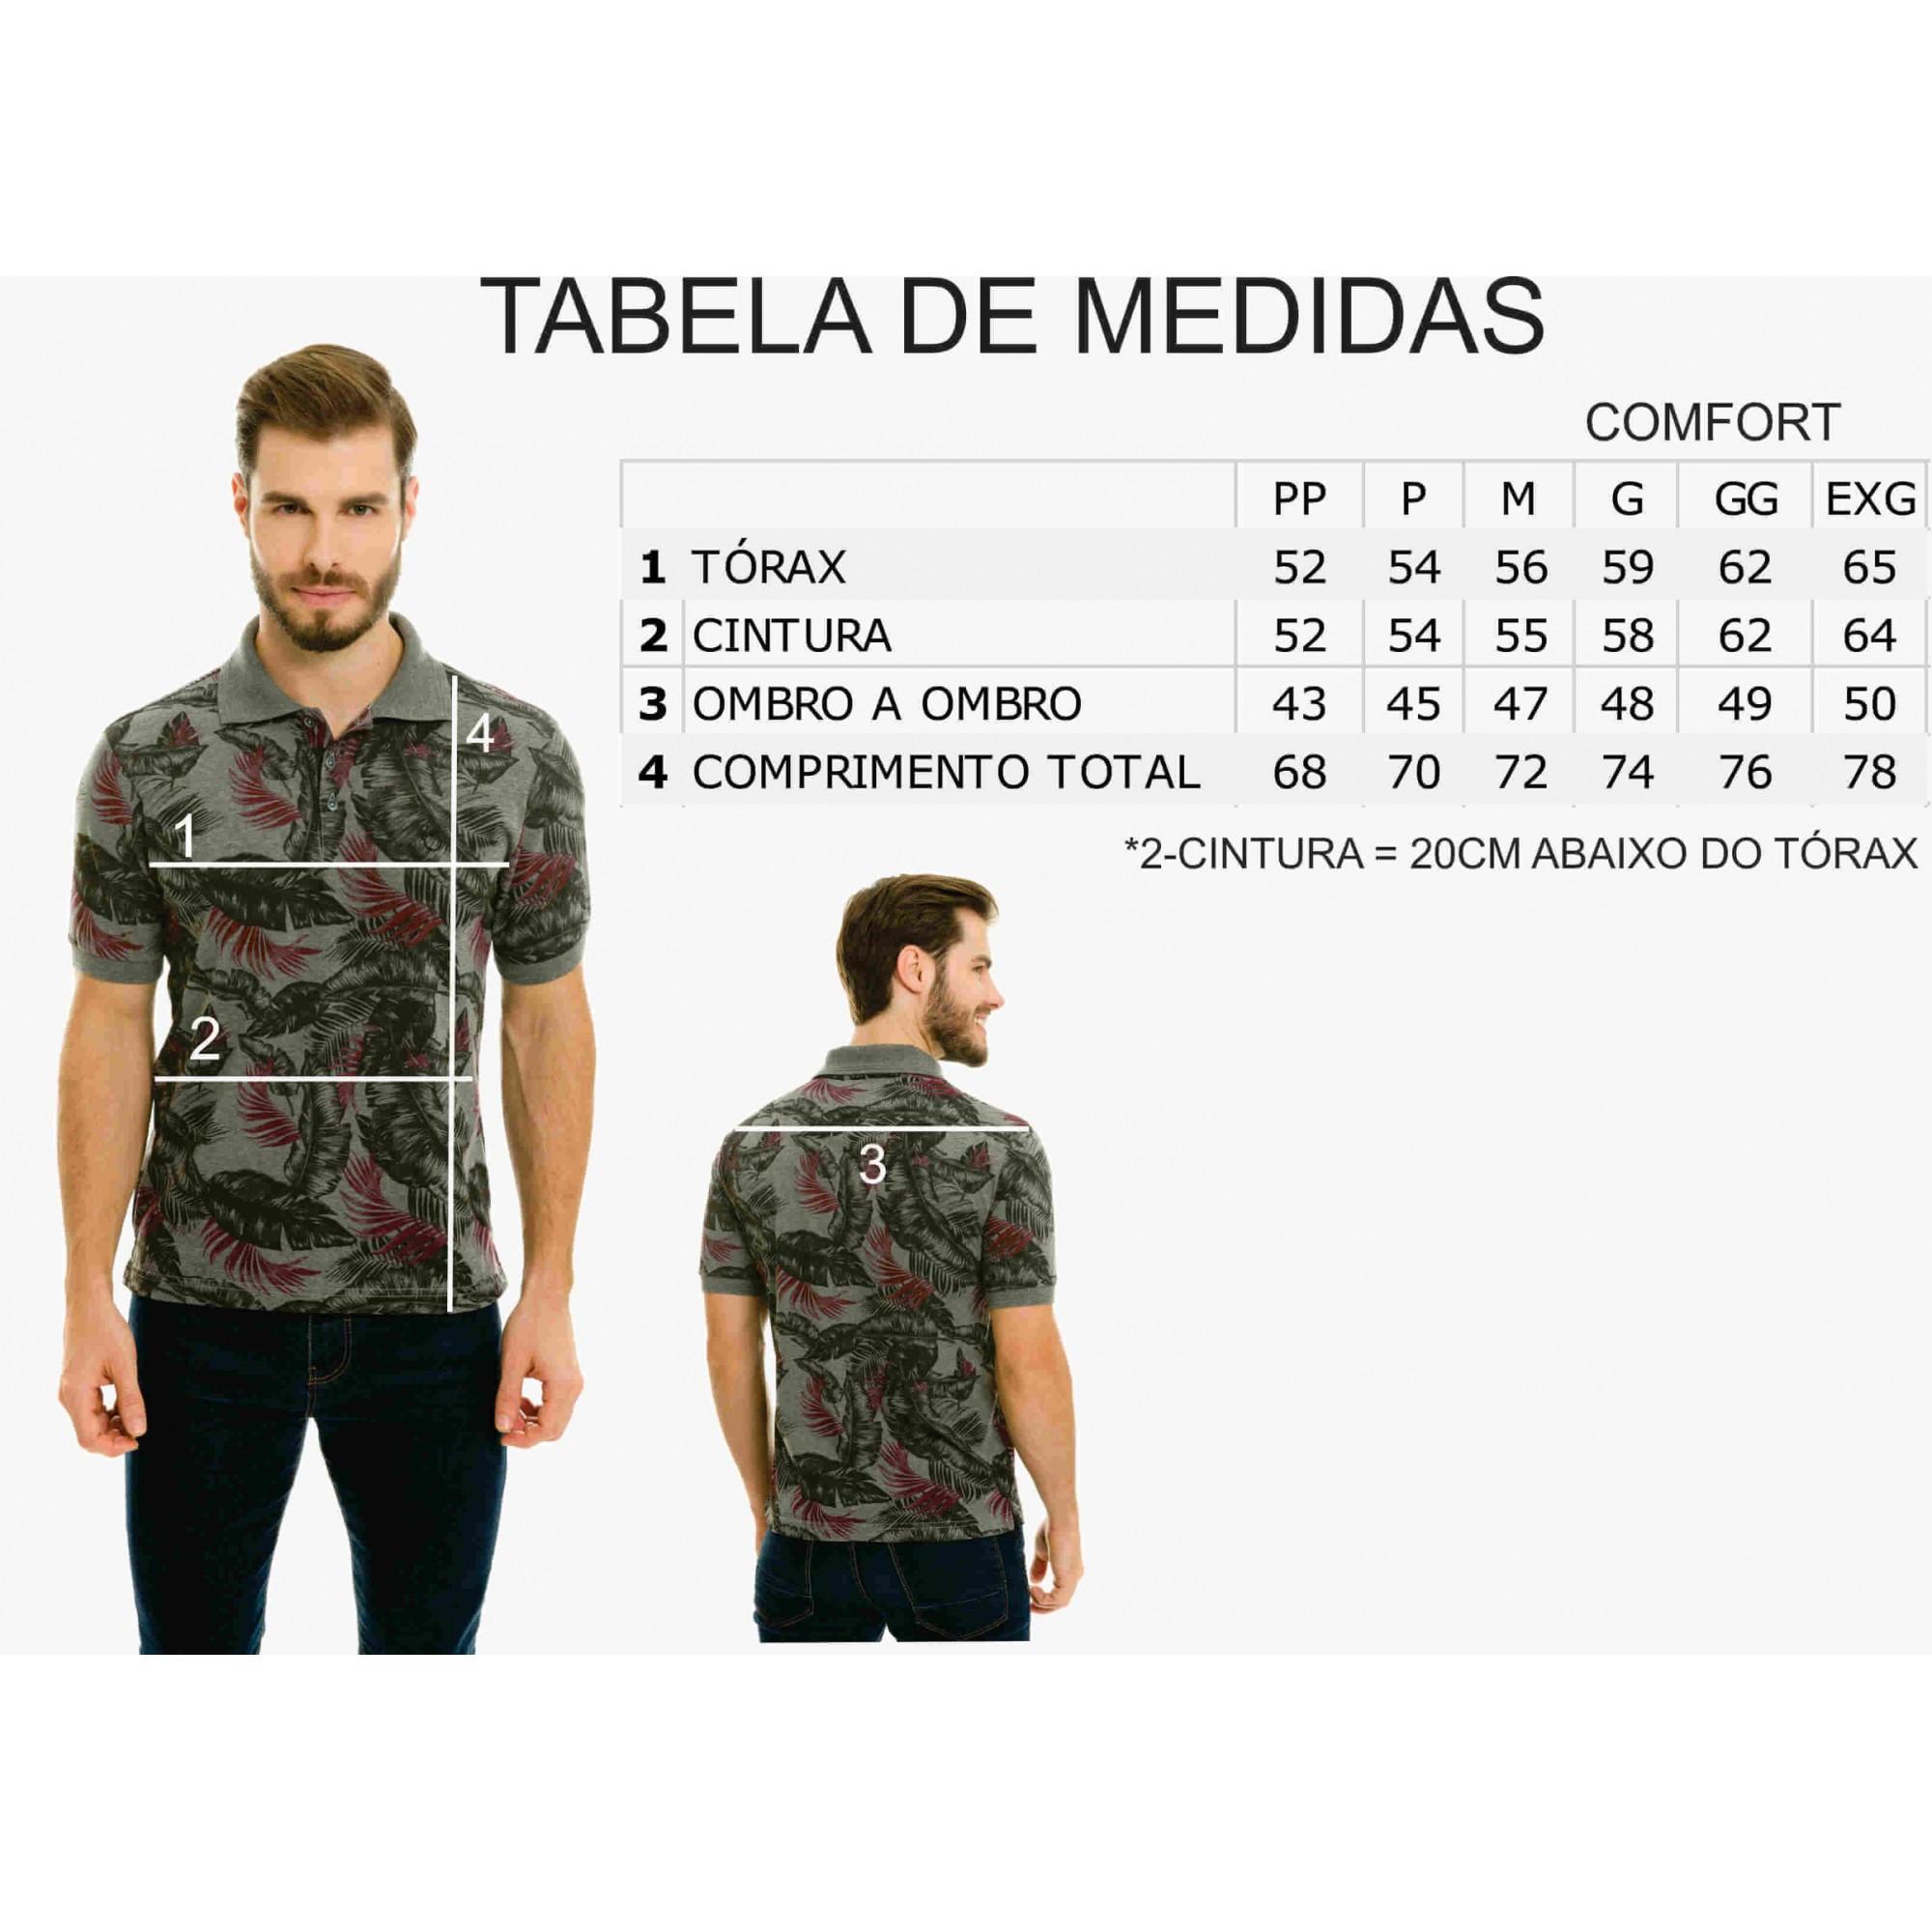 Camisa Gola Polo Olimpo Piquet com Bolso